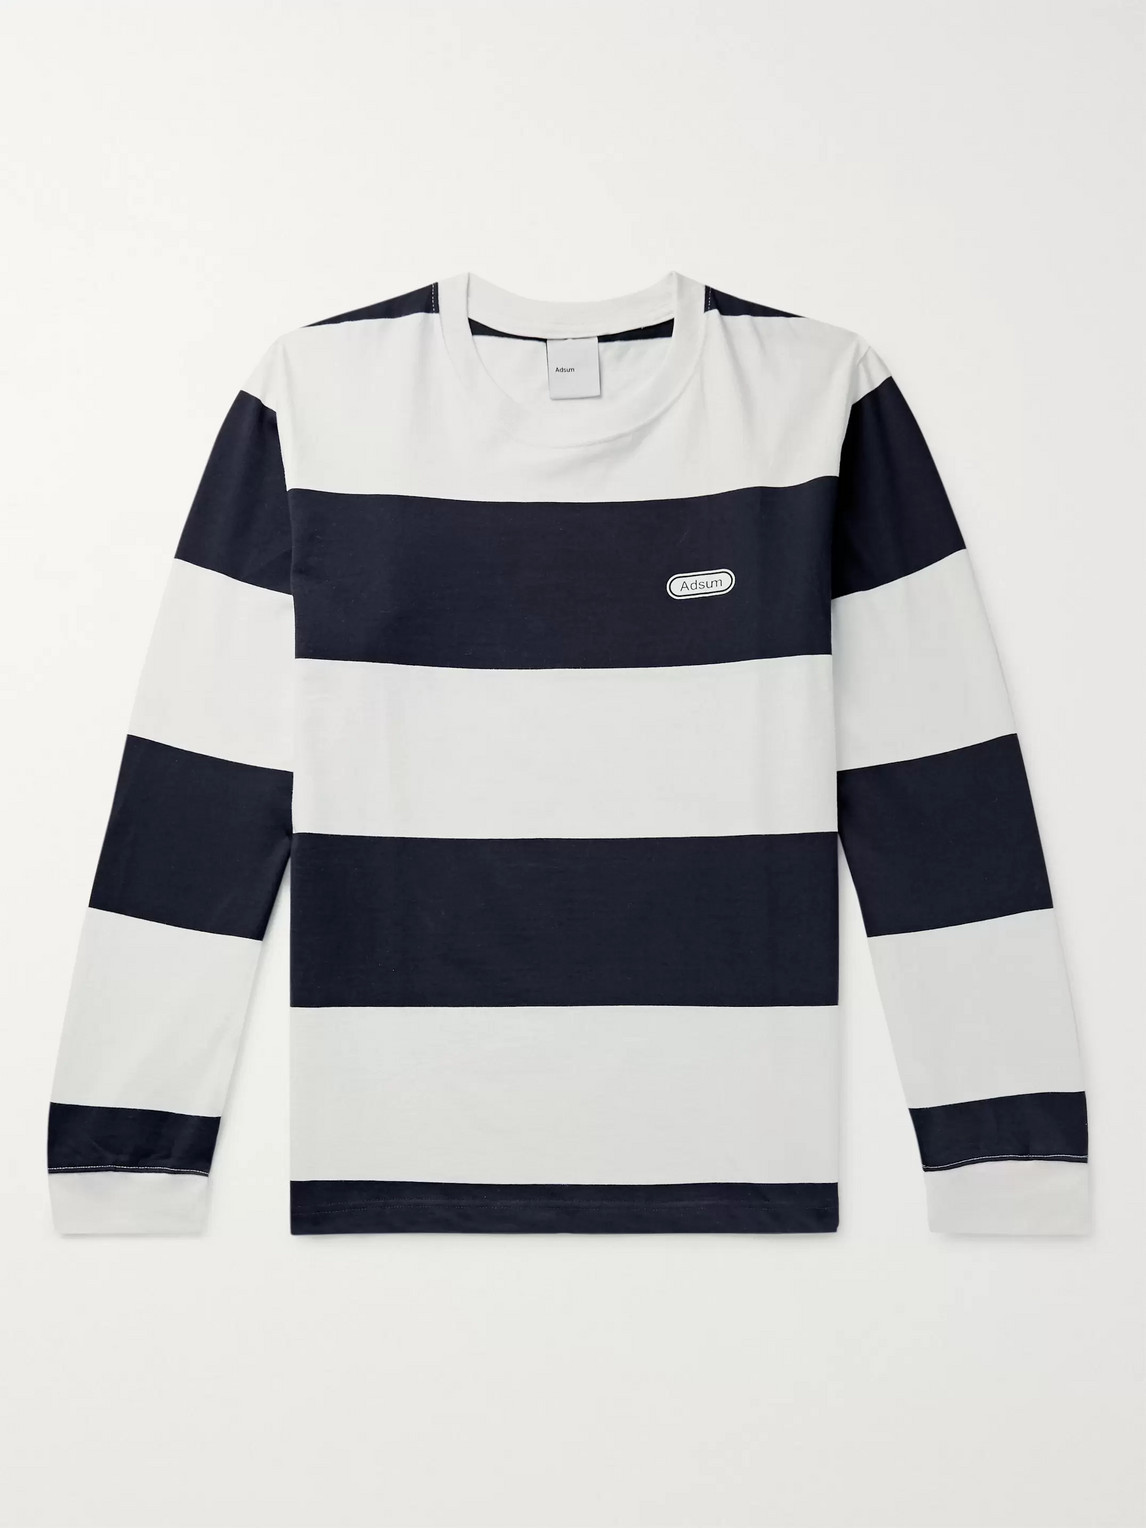 Adsum Logo-print Striped Cotton-jersey T-shirt In Blue